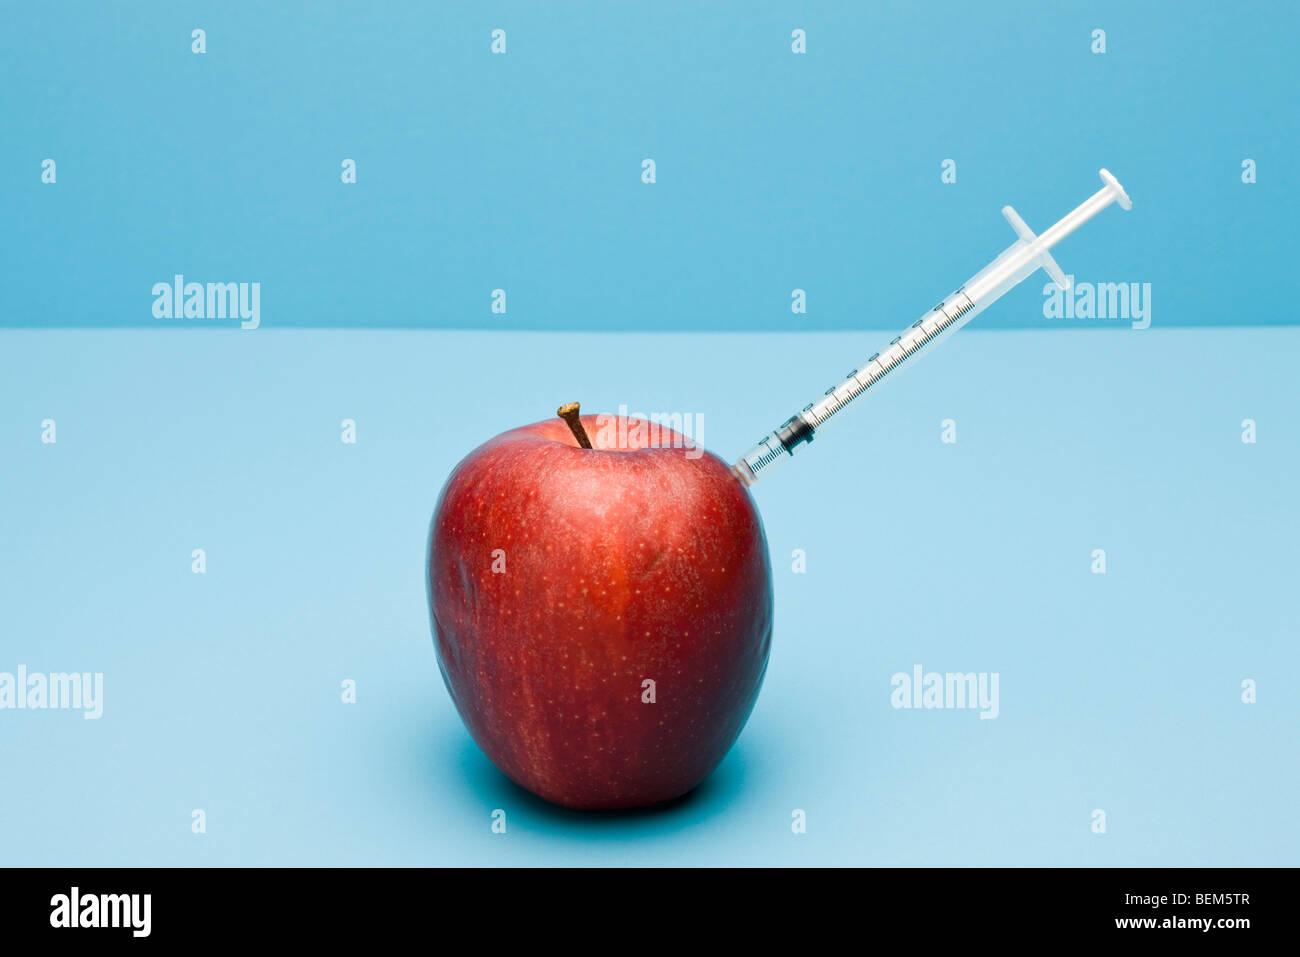 Concepto de alimentos, jeringa saliendo de apple Imagen De Stock